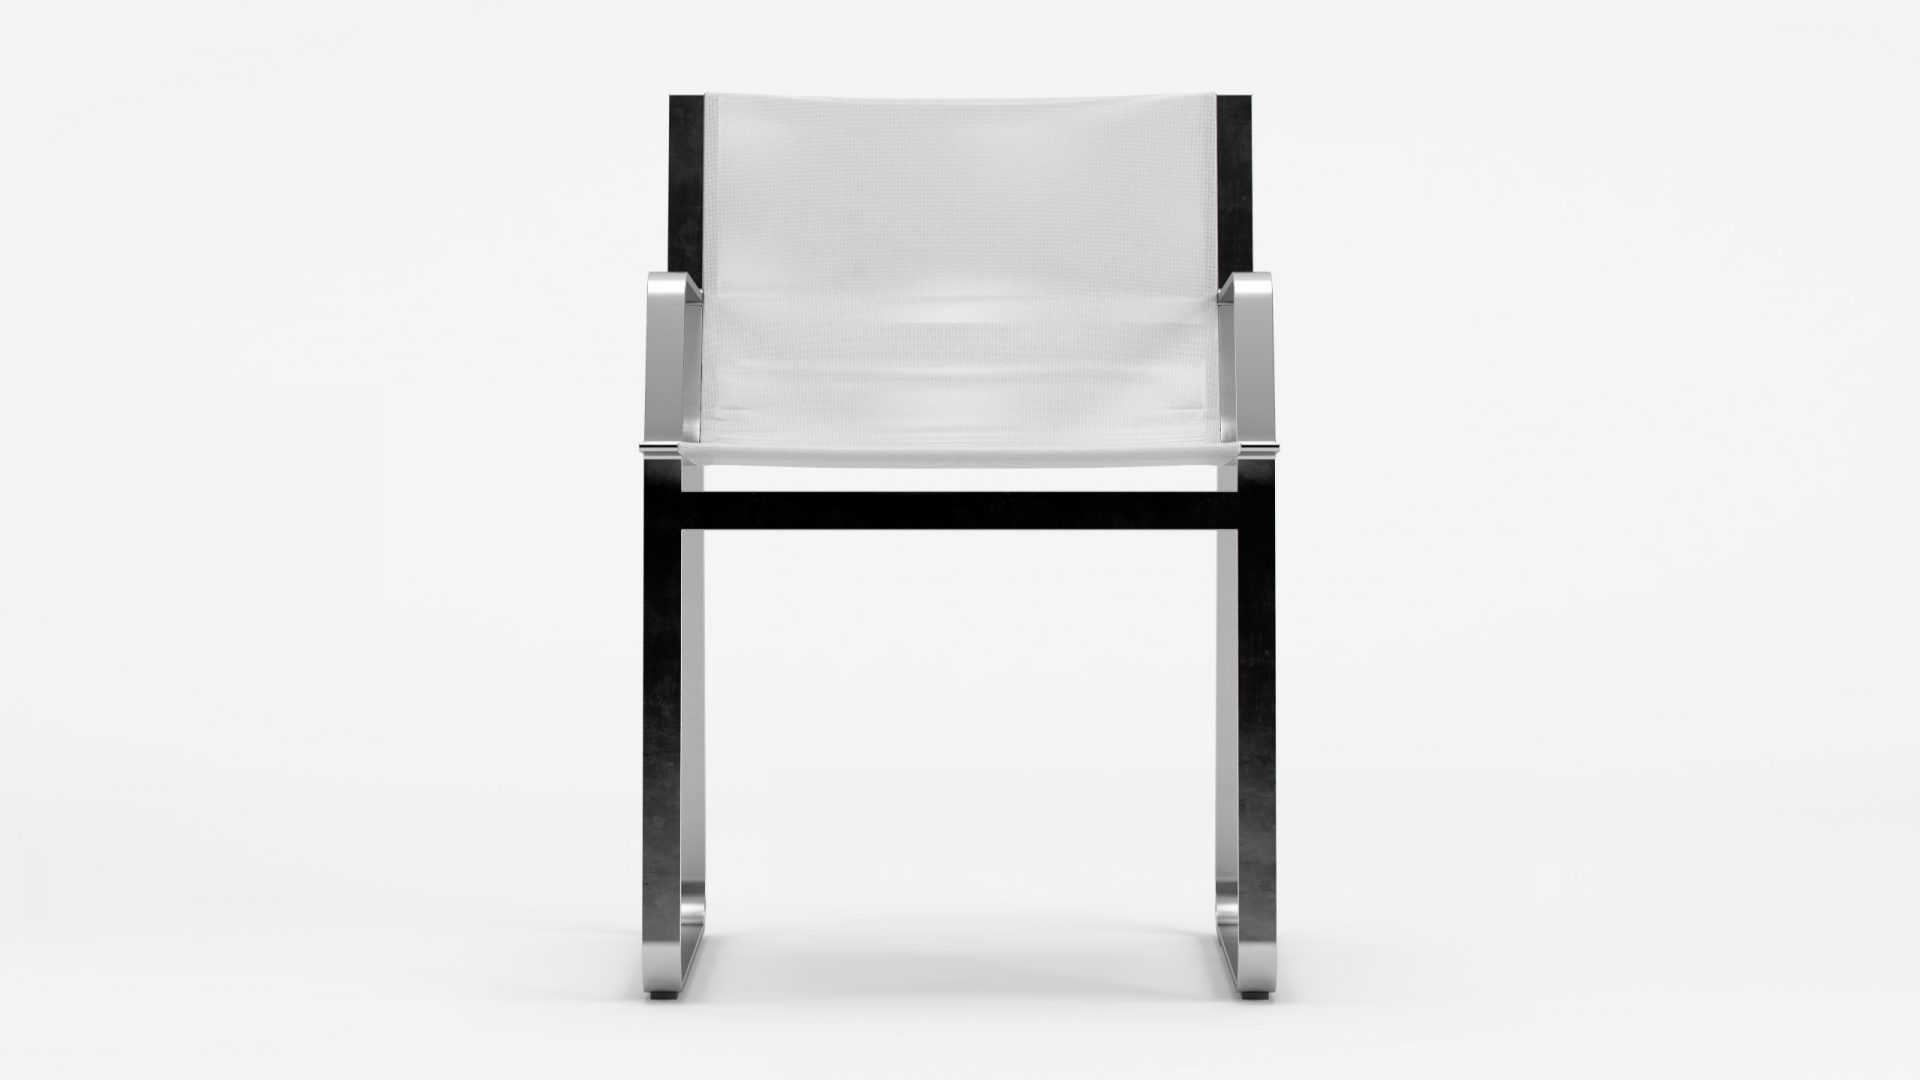 008_Essentiel_Chair_0711E2_WhiteSet_01_0002